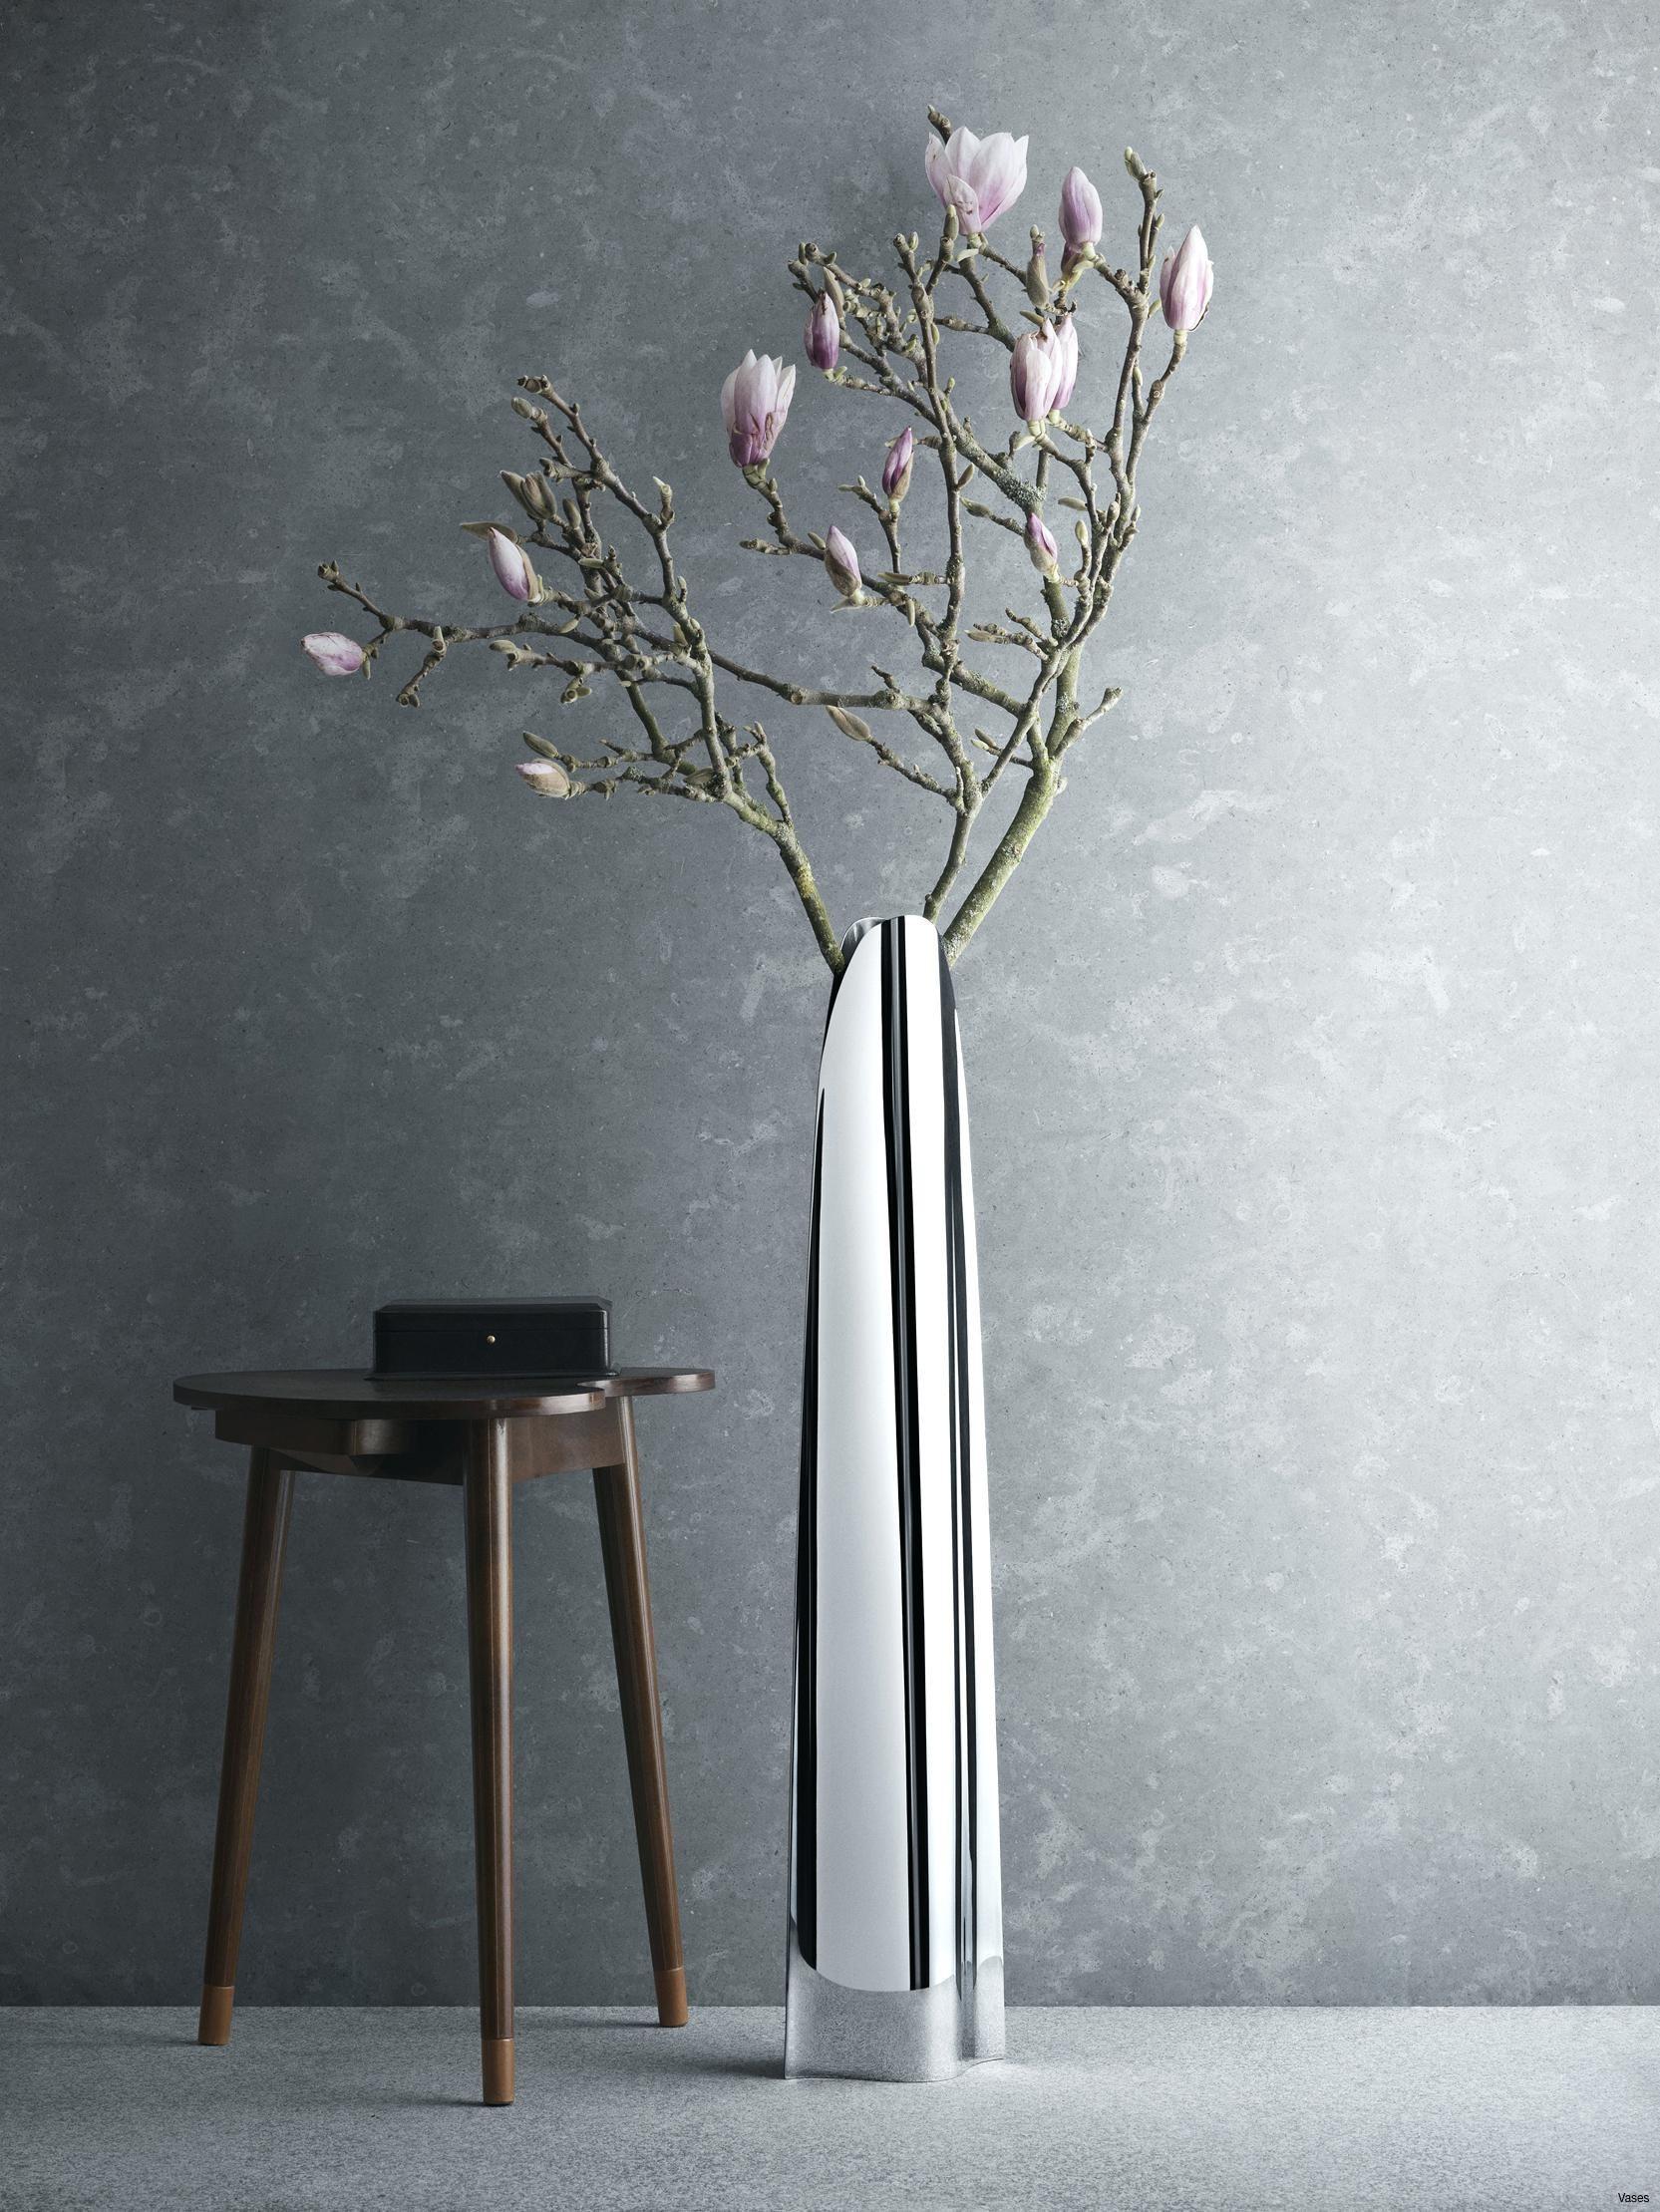 sea glass vase filler of tall floor vase fillers gallery decorating ideas for tall vases intended for decorating ideas for tall vases fresh floor vase filler ideas